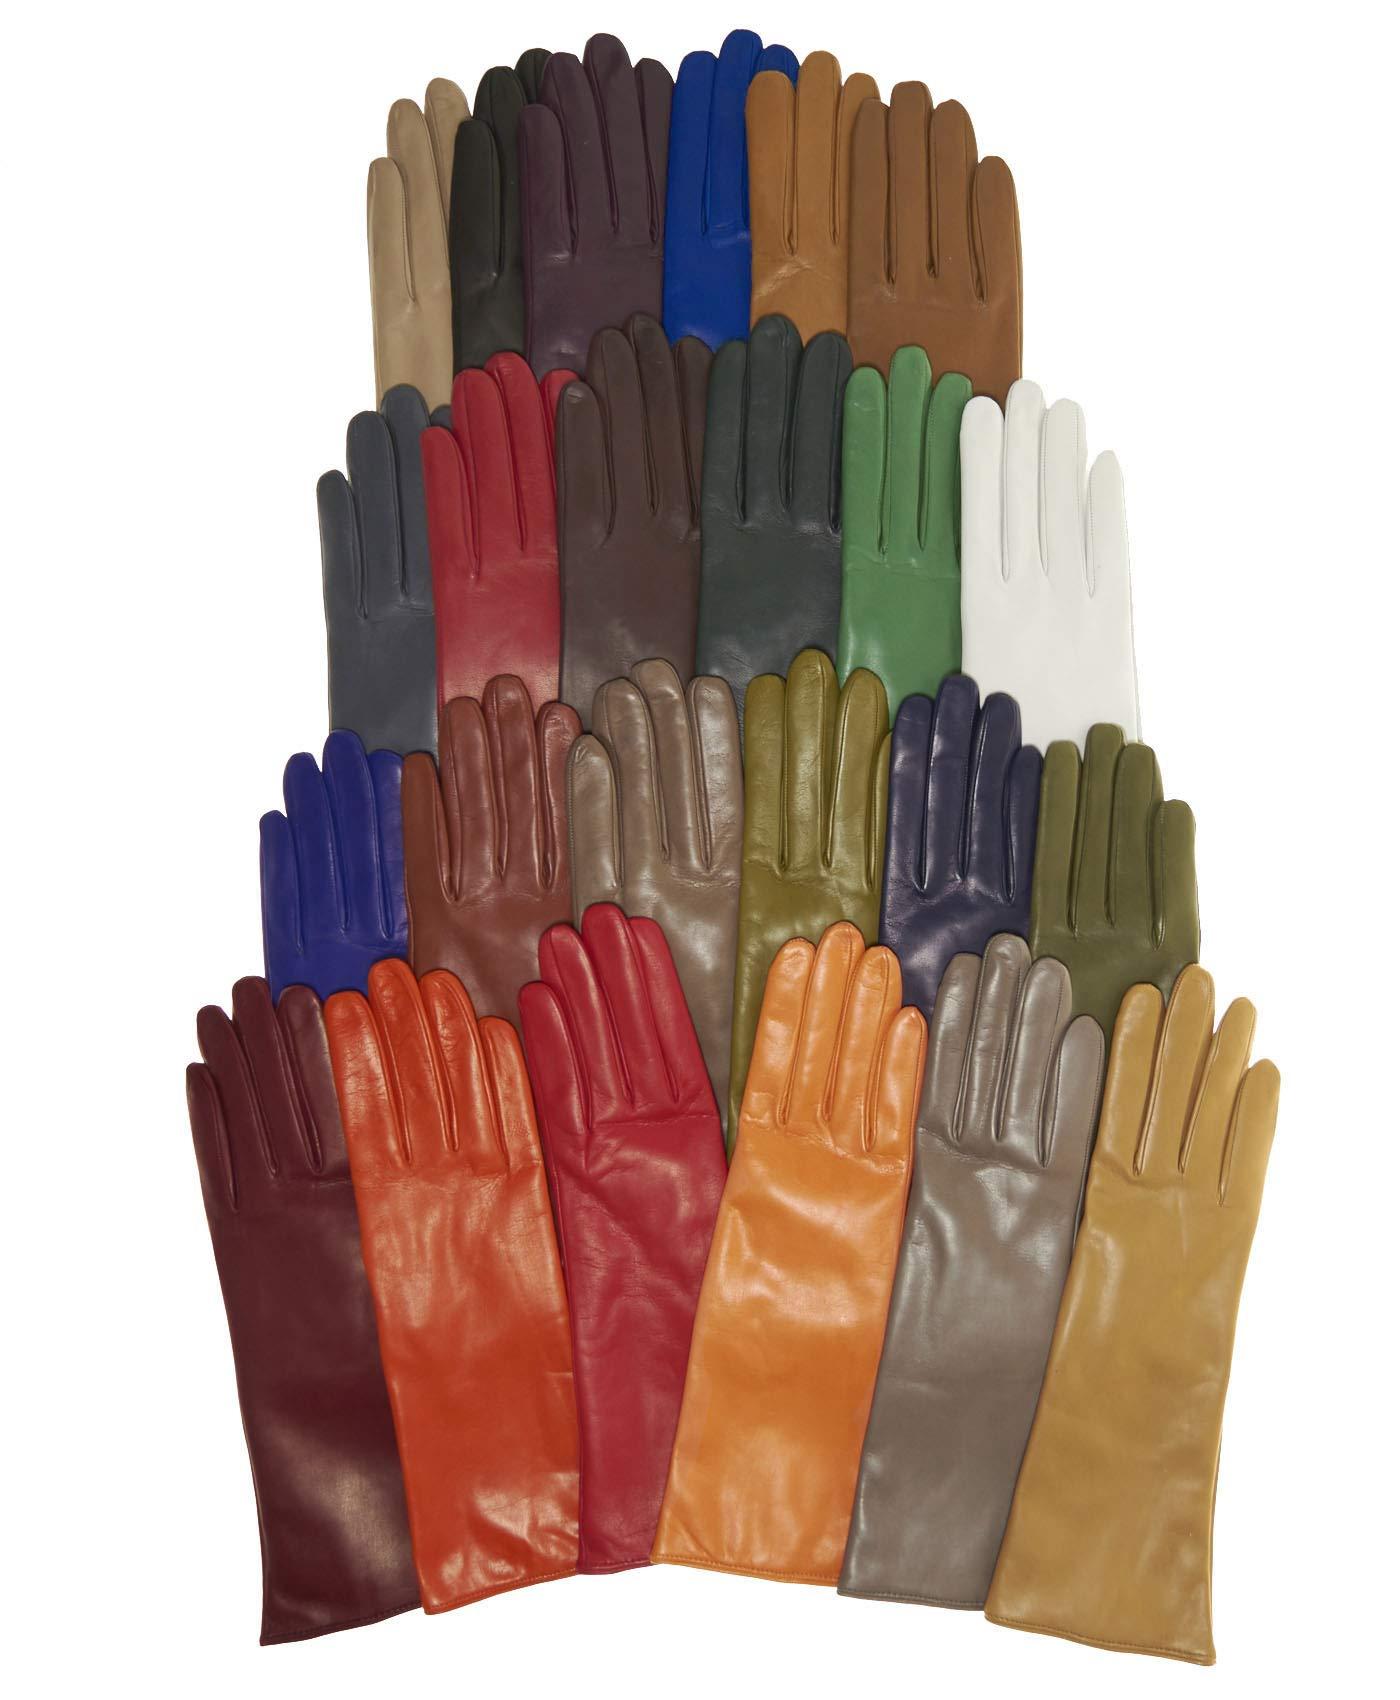 Fratelli Orsini Women's Italian''4 Button Length'' Cashmere Lined Leather Gloves Size 8 1/2 Color Black